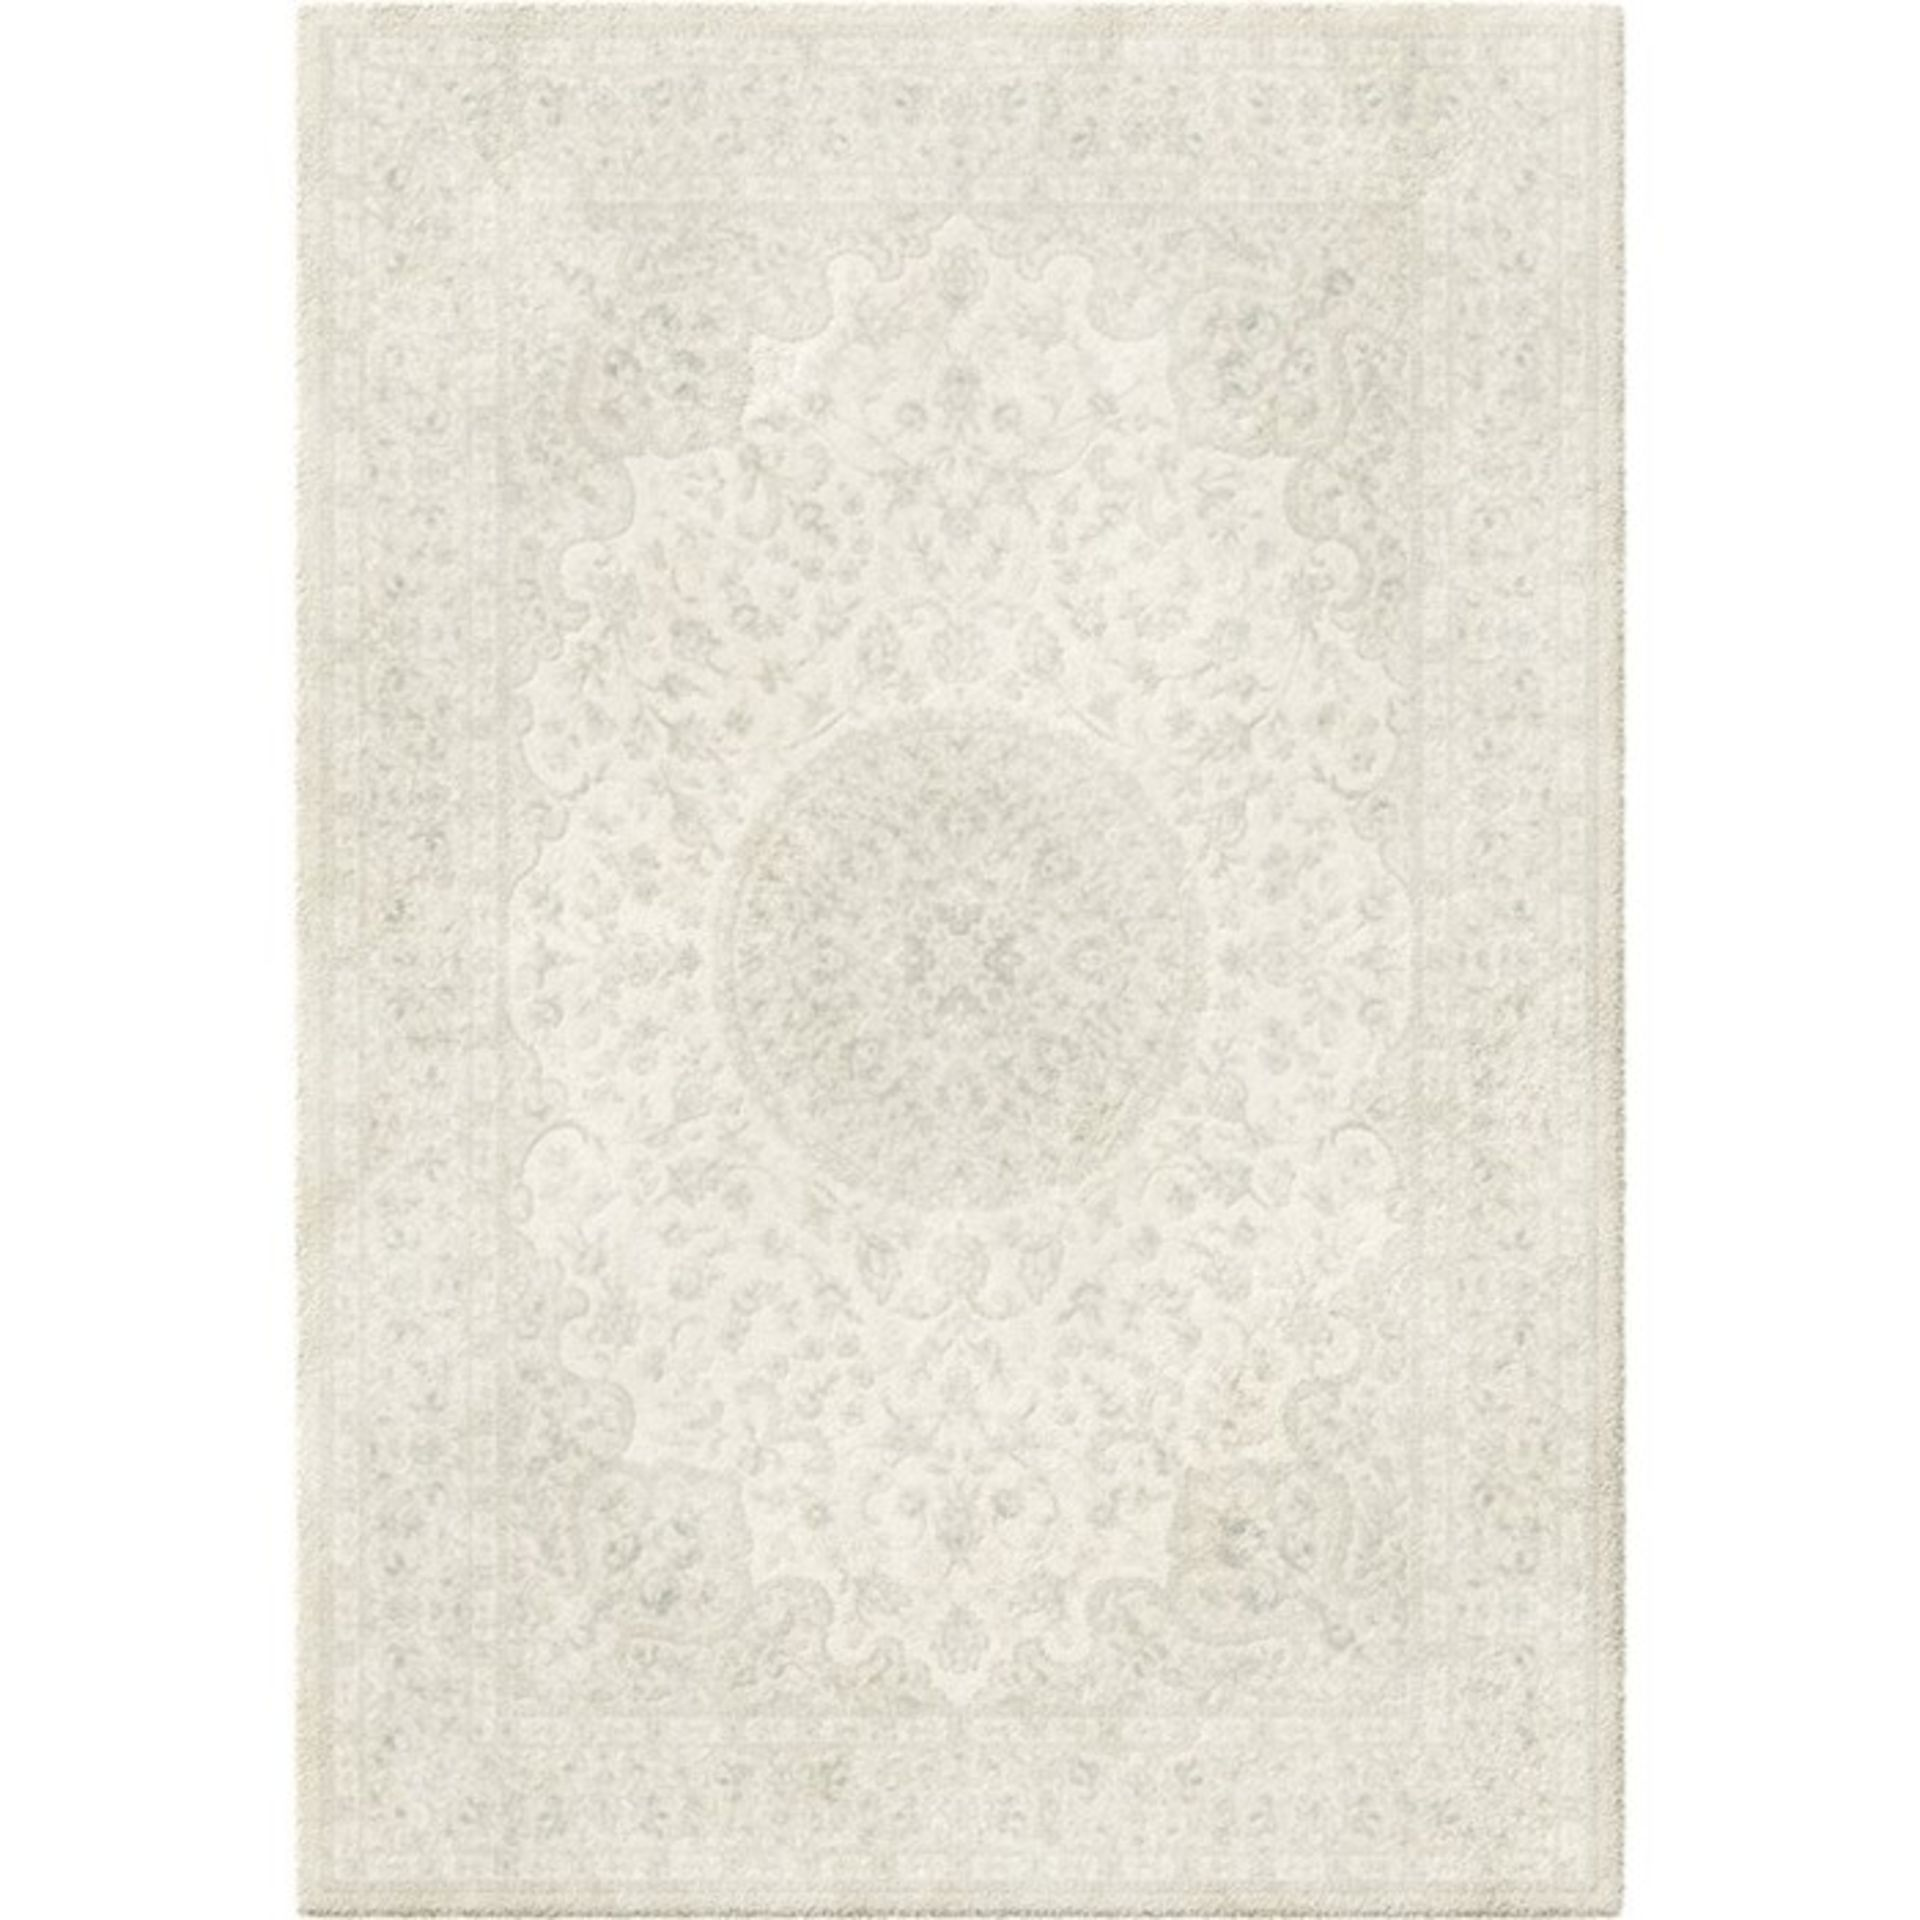 Nicolette Cream Rug Rug Size: Rectangle 160 x 230cm (HL7 - 3/4 -HOKG7679.37865979)